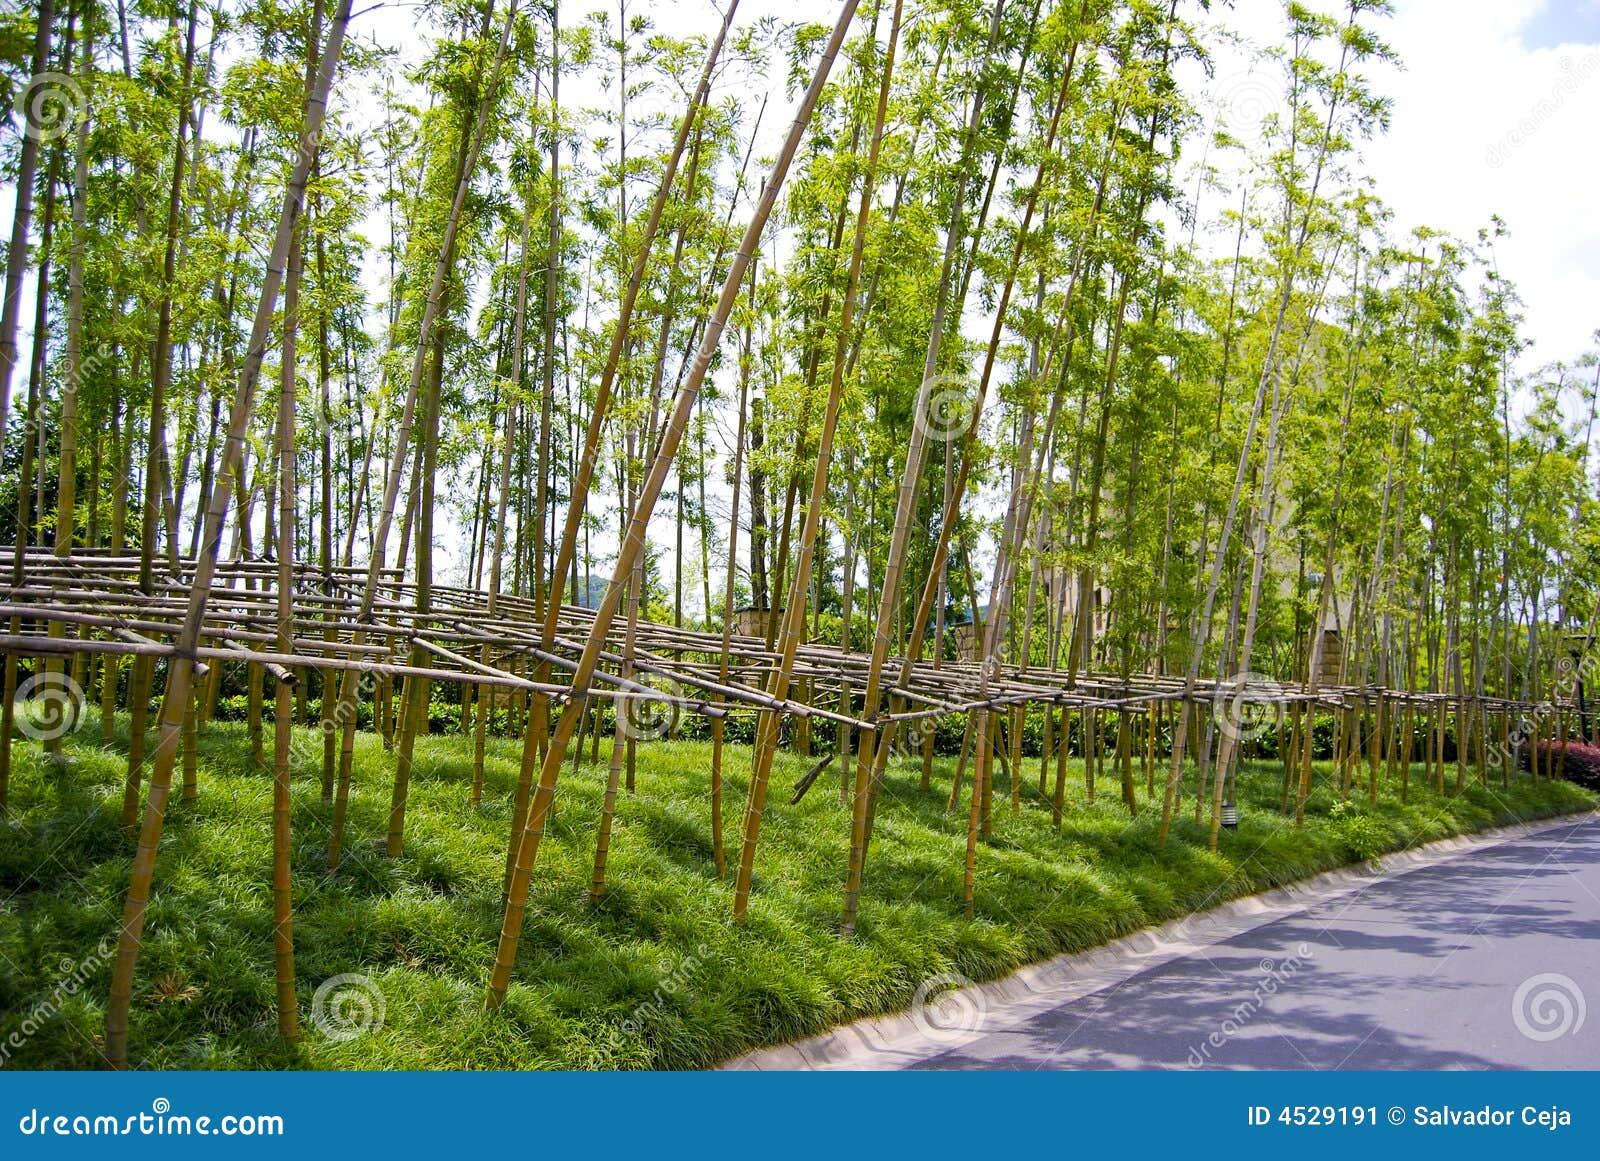 Jard n de bamb for Jardin bambu